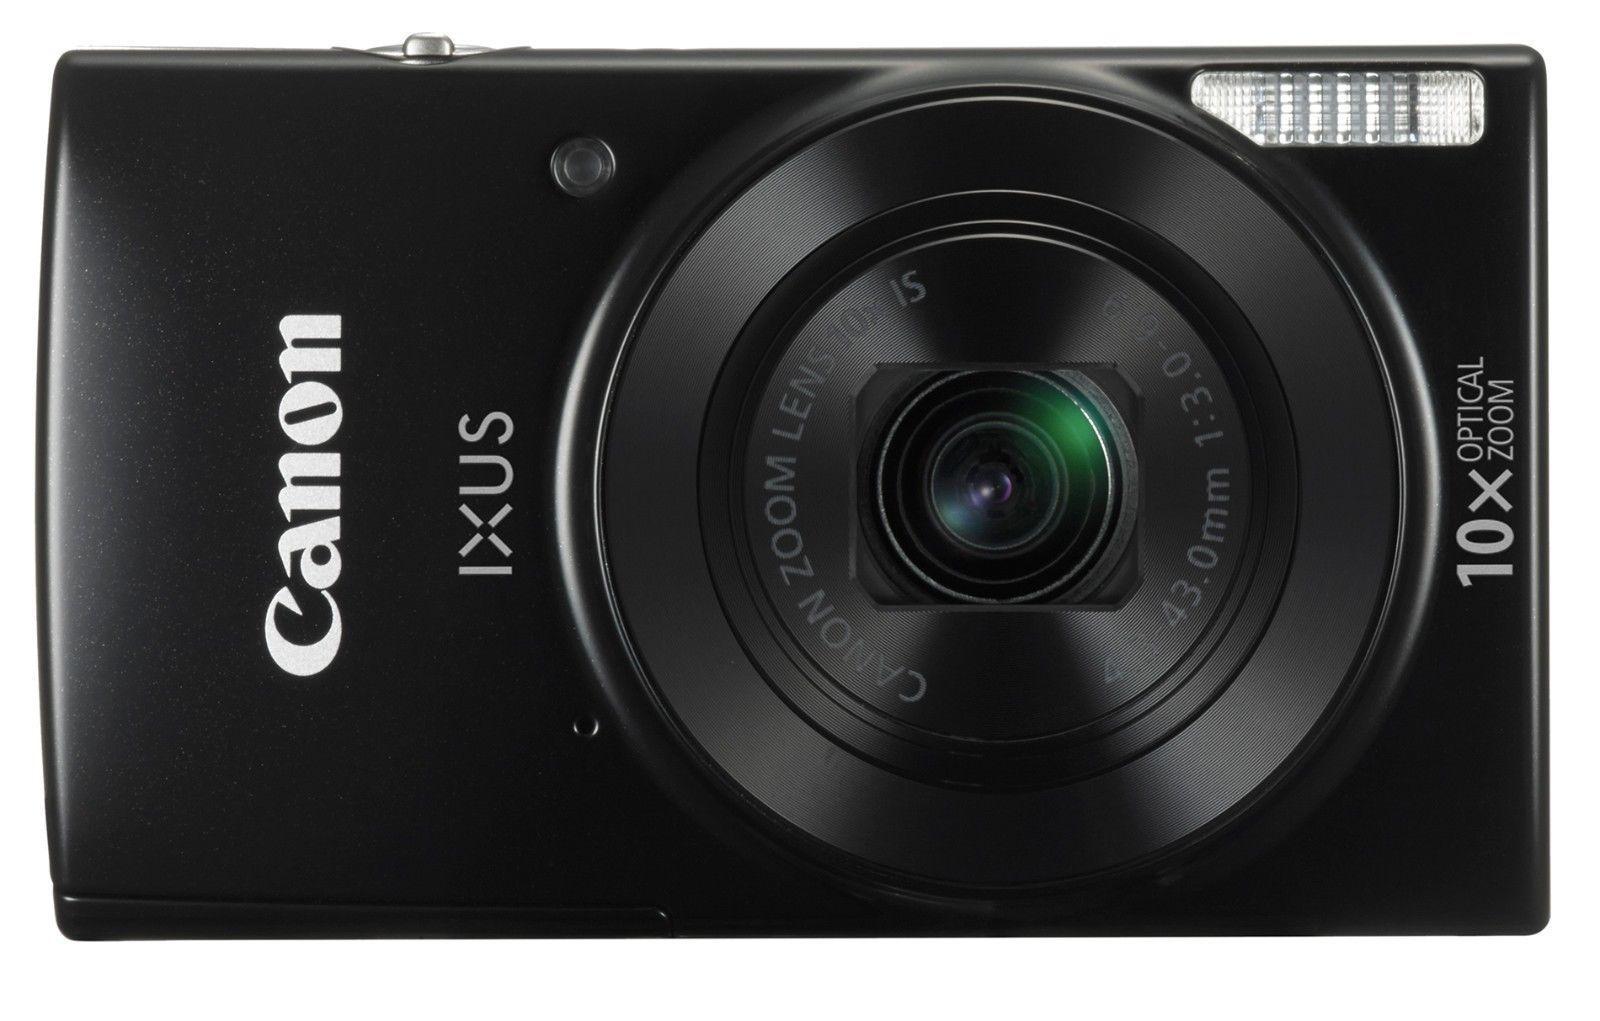 Charming Canon Digital Camera Pakistan Canon Elph 160 Ebay And Similar Items Canon Elph 160 Price dpreview Canon Elph 160